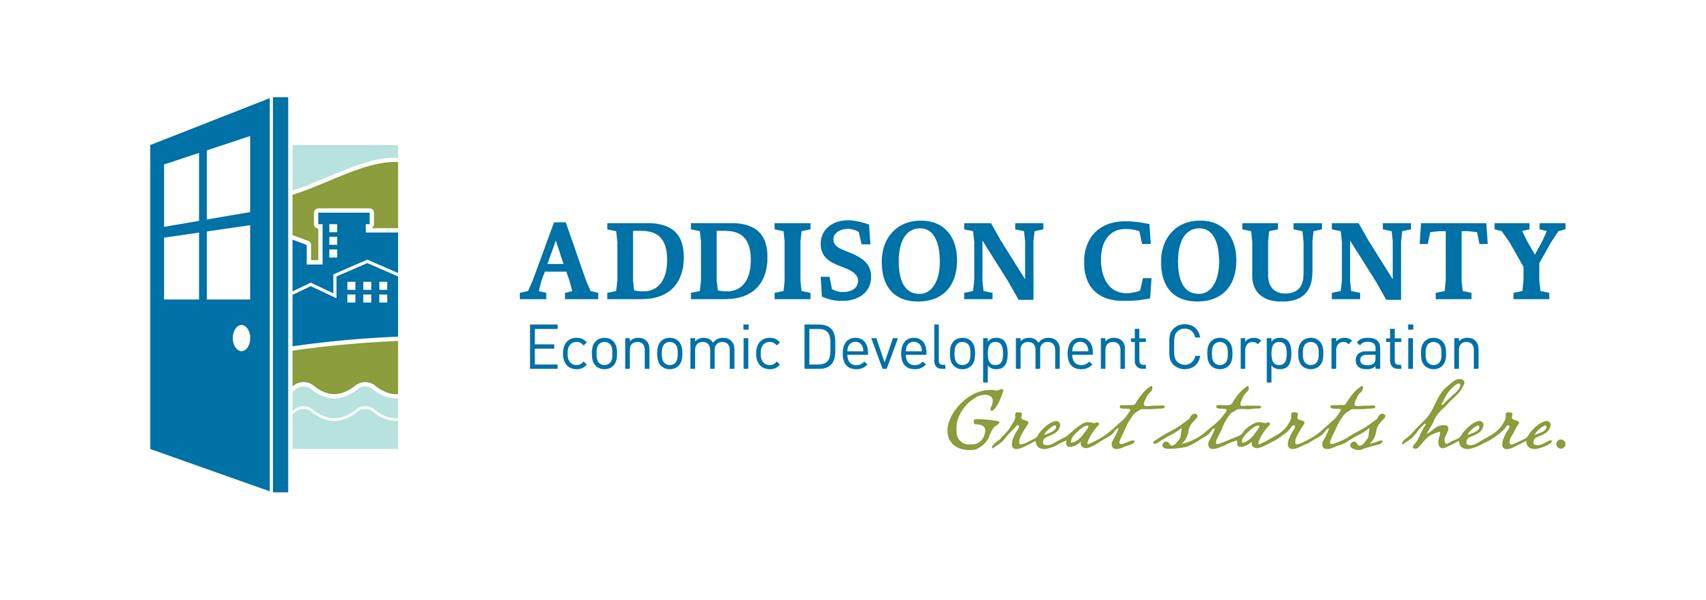 Addison County Economic Development Corporation